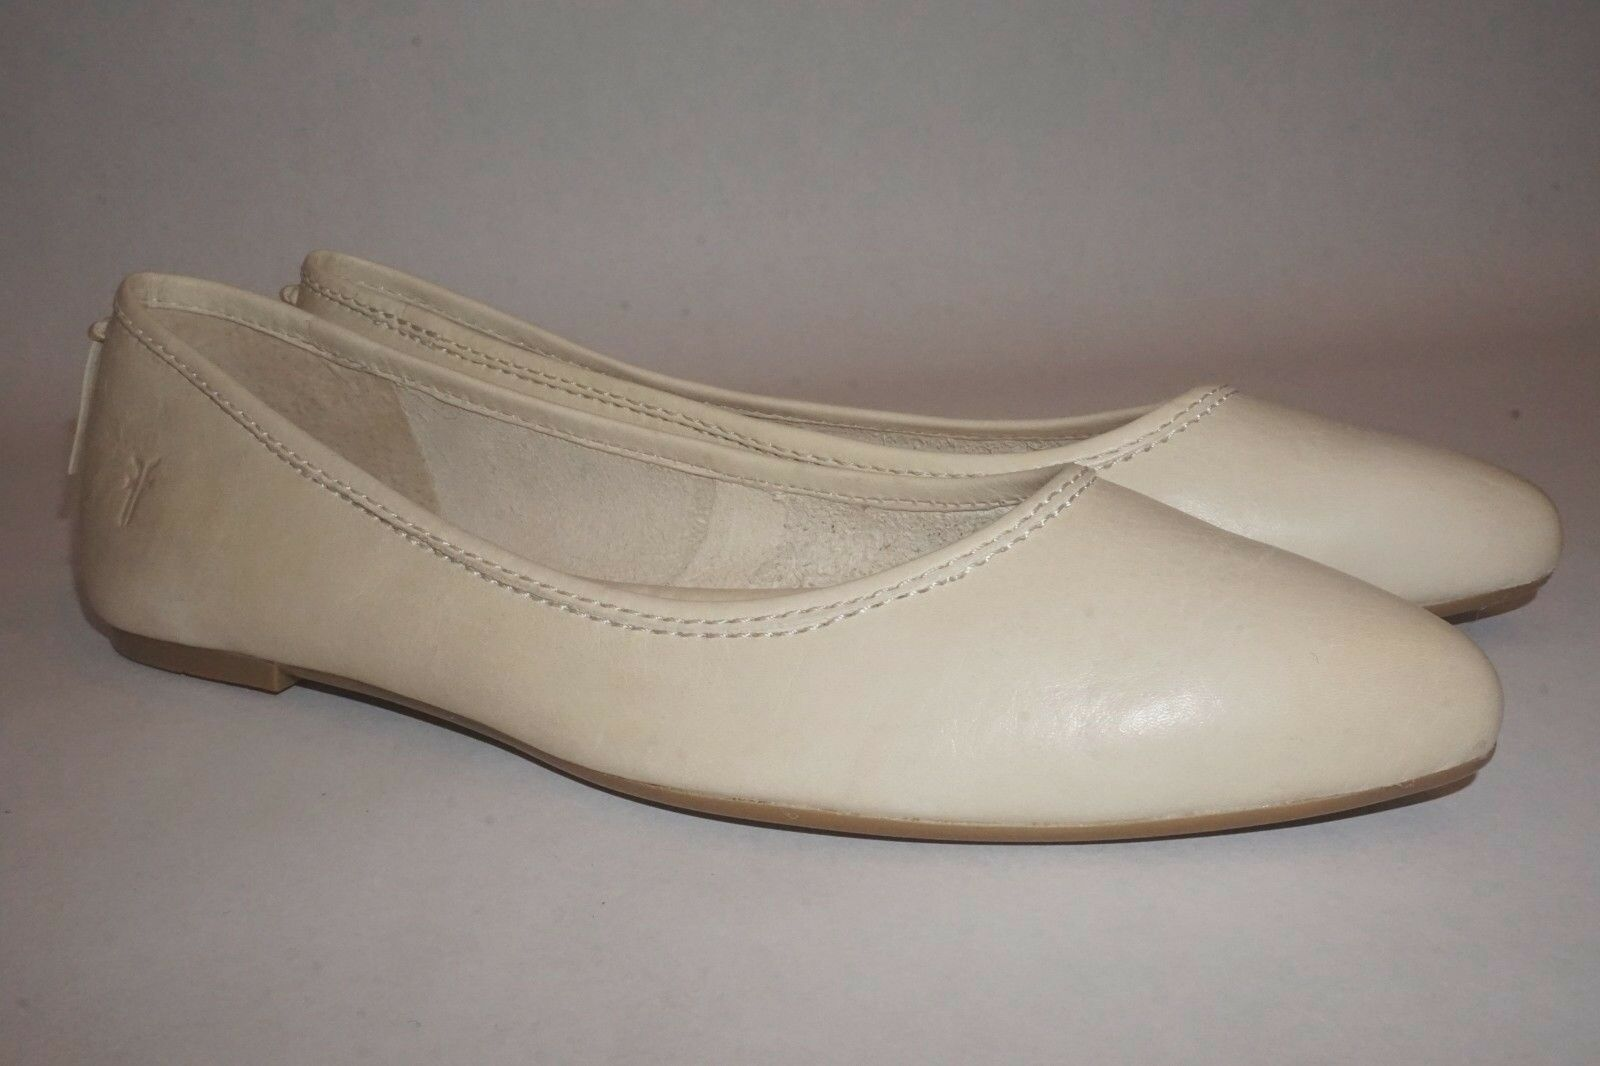 FRYE Regina Ballet Leder flat slip on pointed toe M sz 9 M toe Beige Bone 3274e1